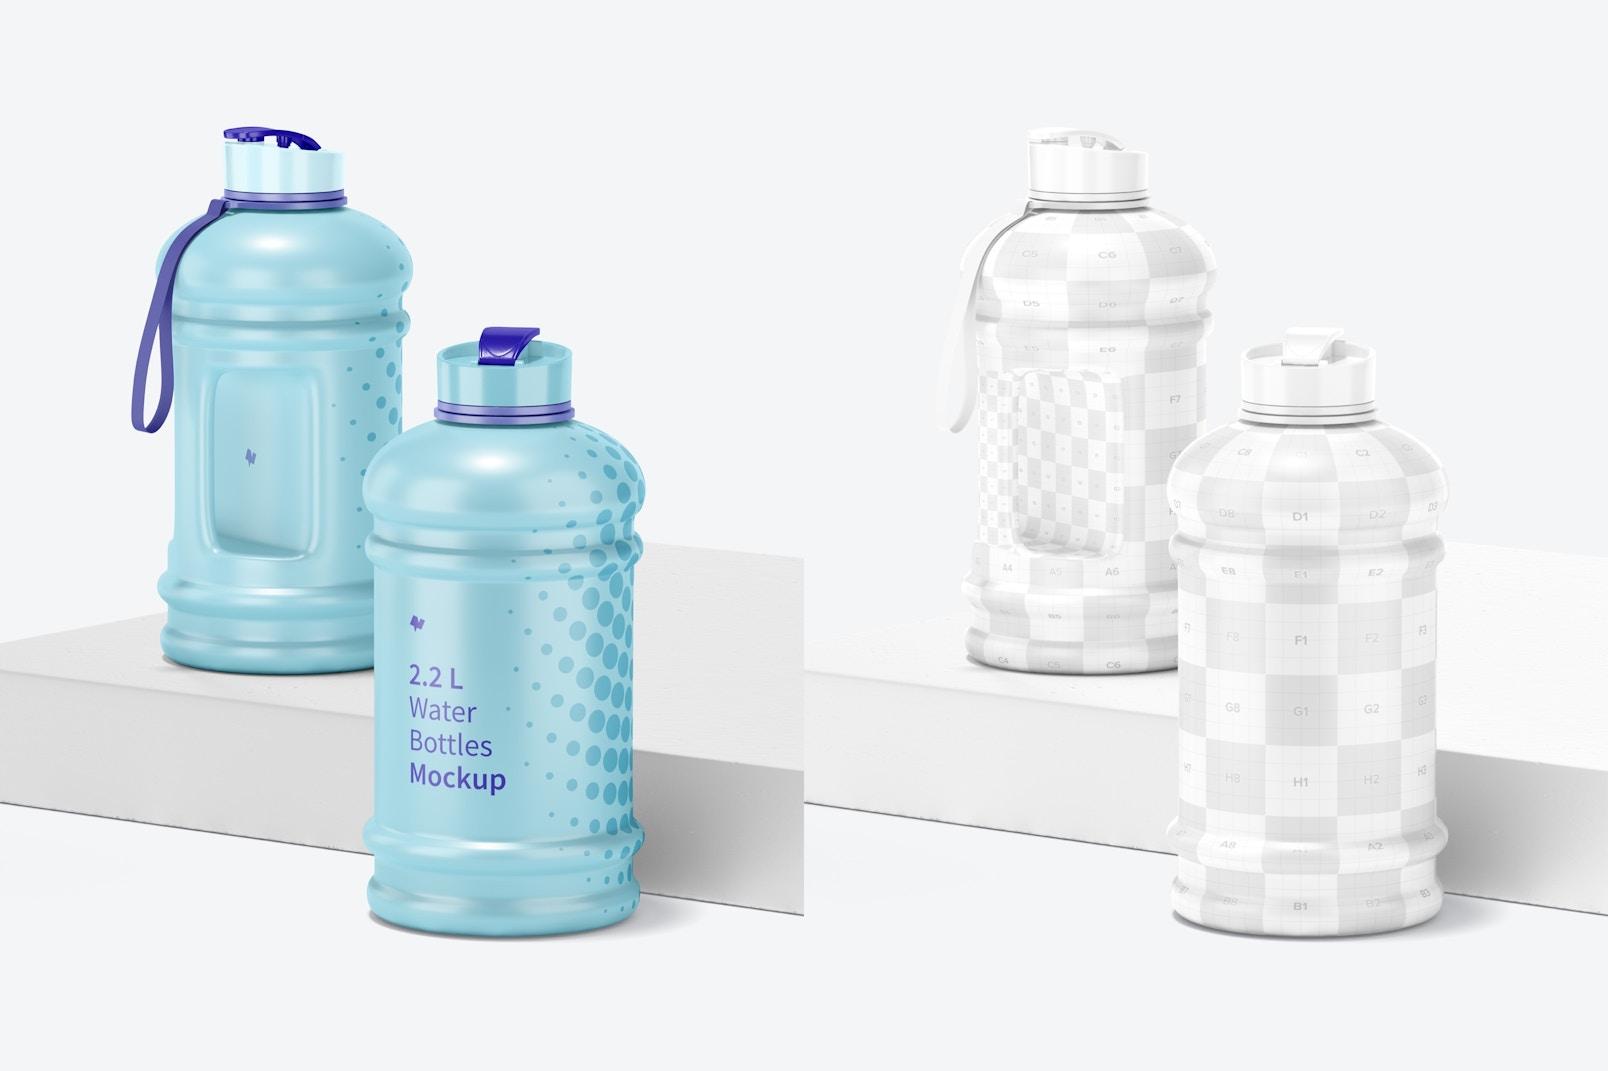 Maqueta de Botellas de Agua de 2.2 L, Perspectiva